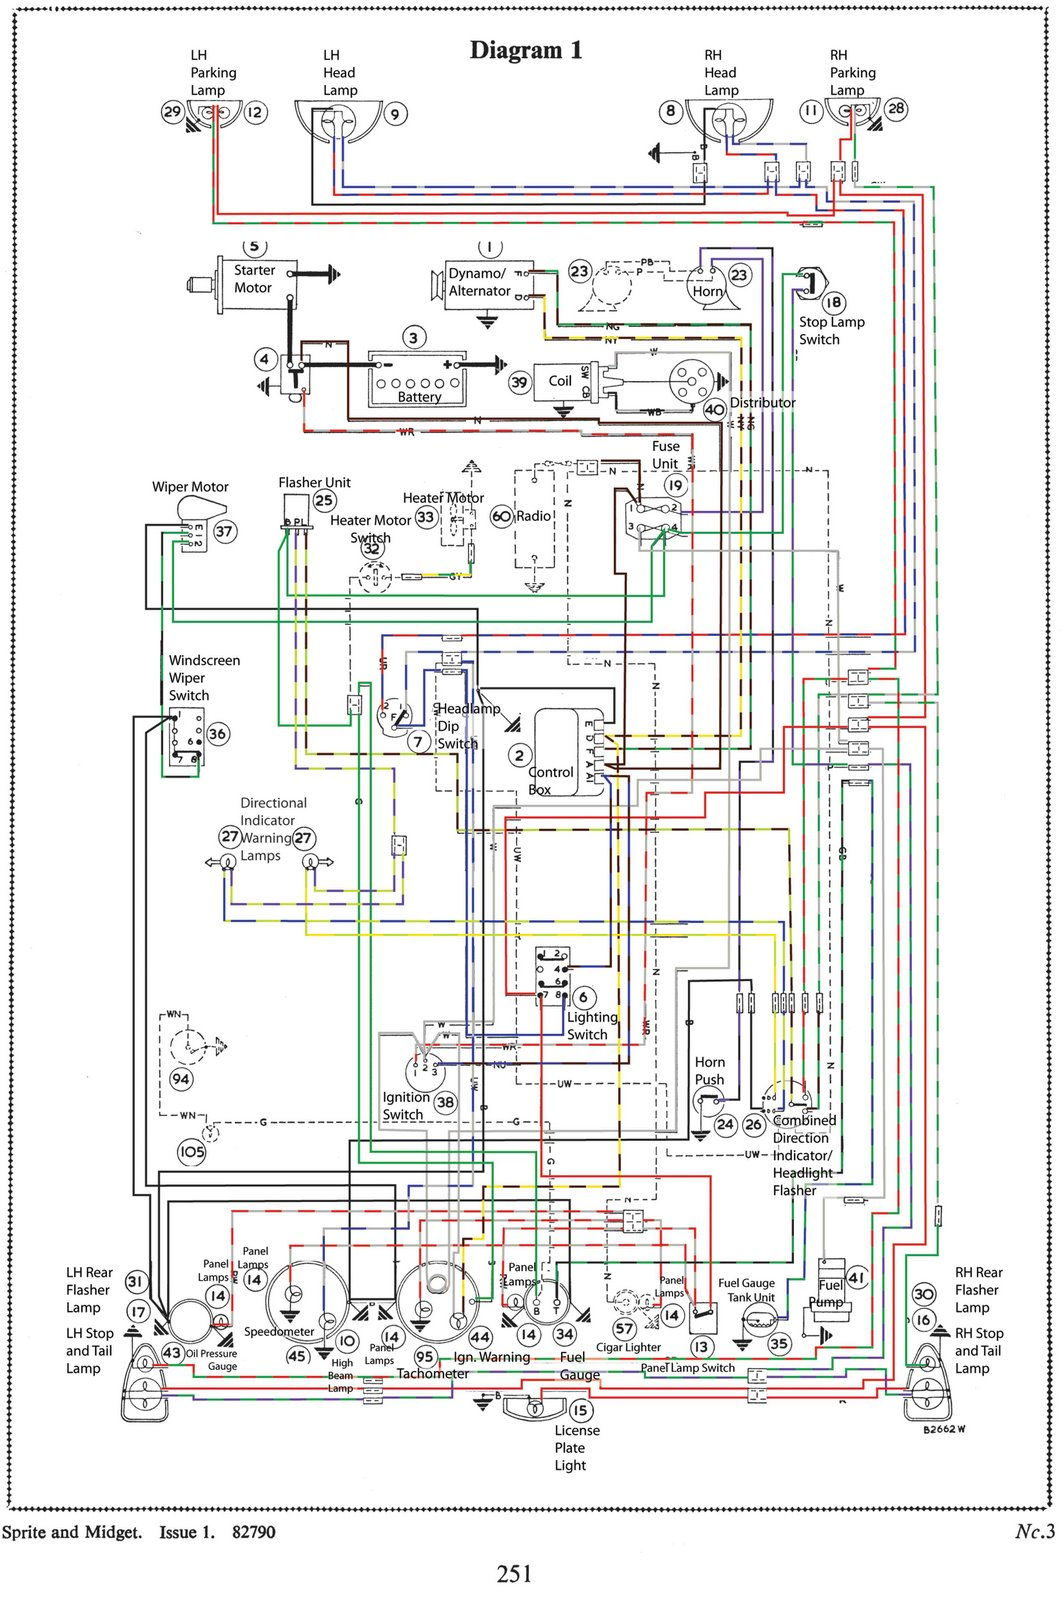 small resolution of 1975 mgb fuse box search for wiring diagrams u2022 rh stephenpoon co 1980 mgb fuse box